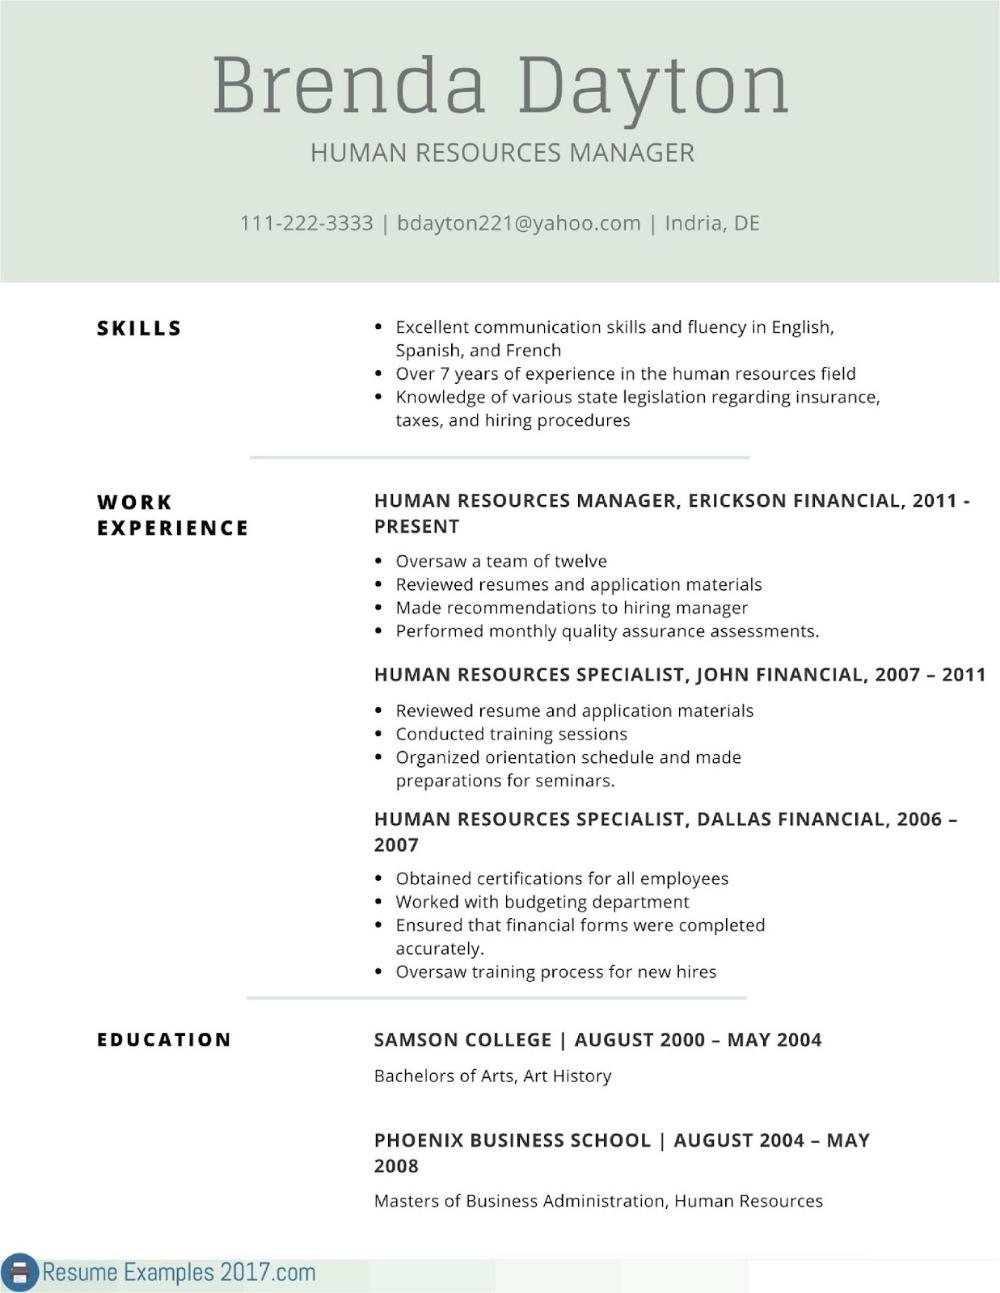 Nursing Resume Examples 2020 | Summary For Resume - kcdrwebshop